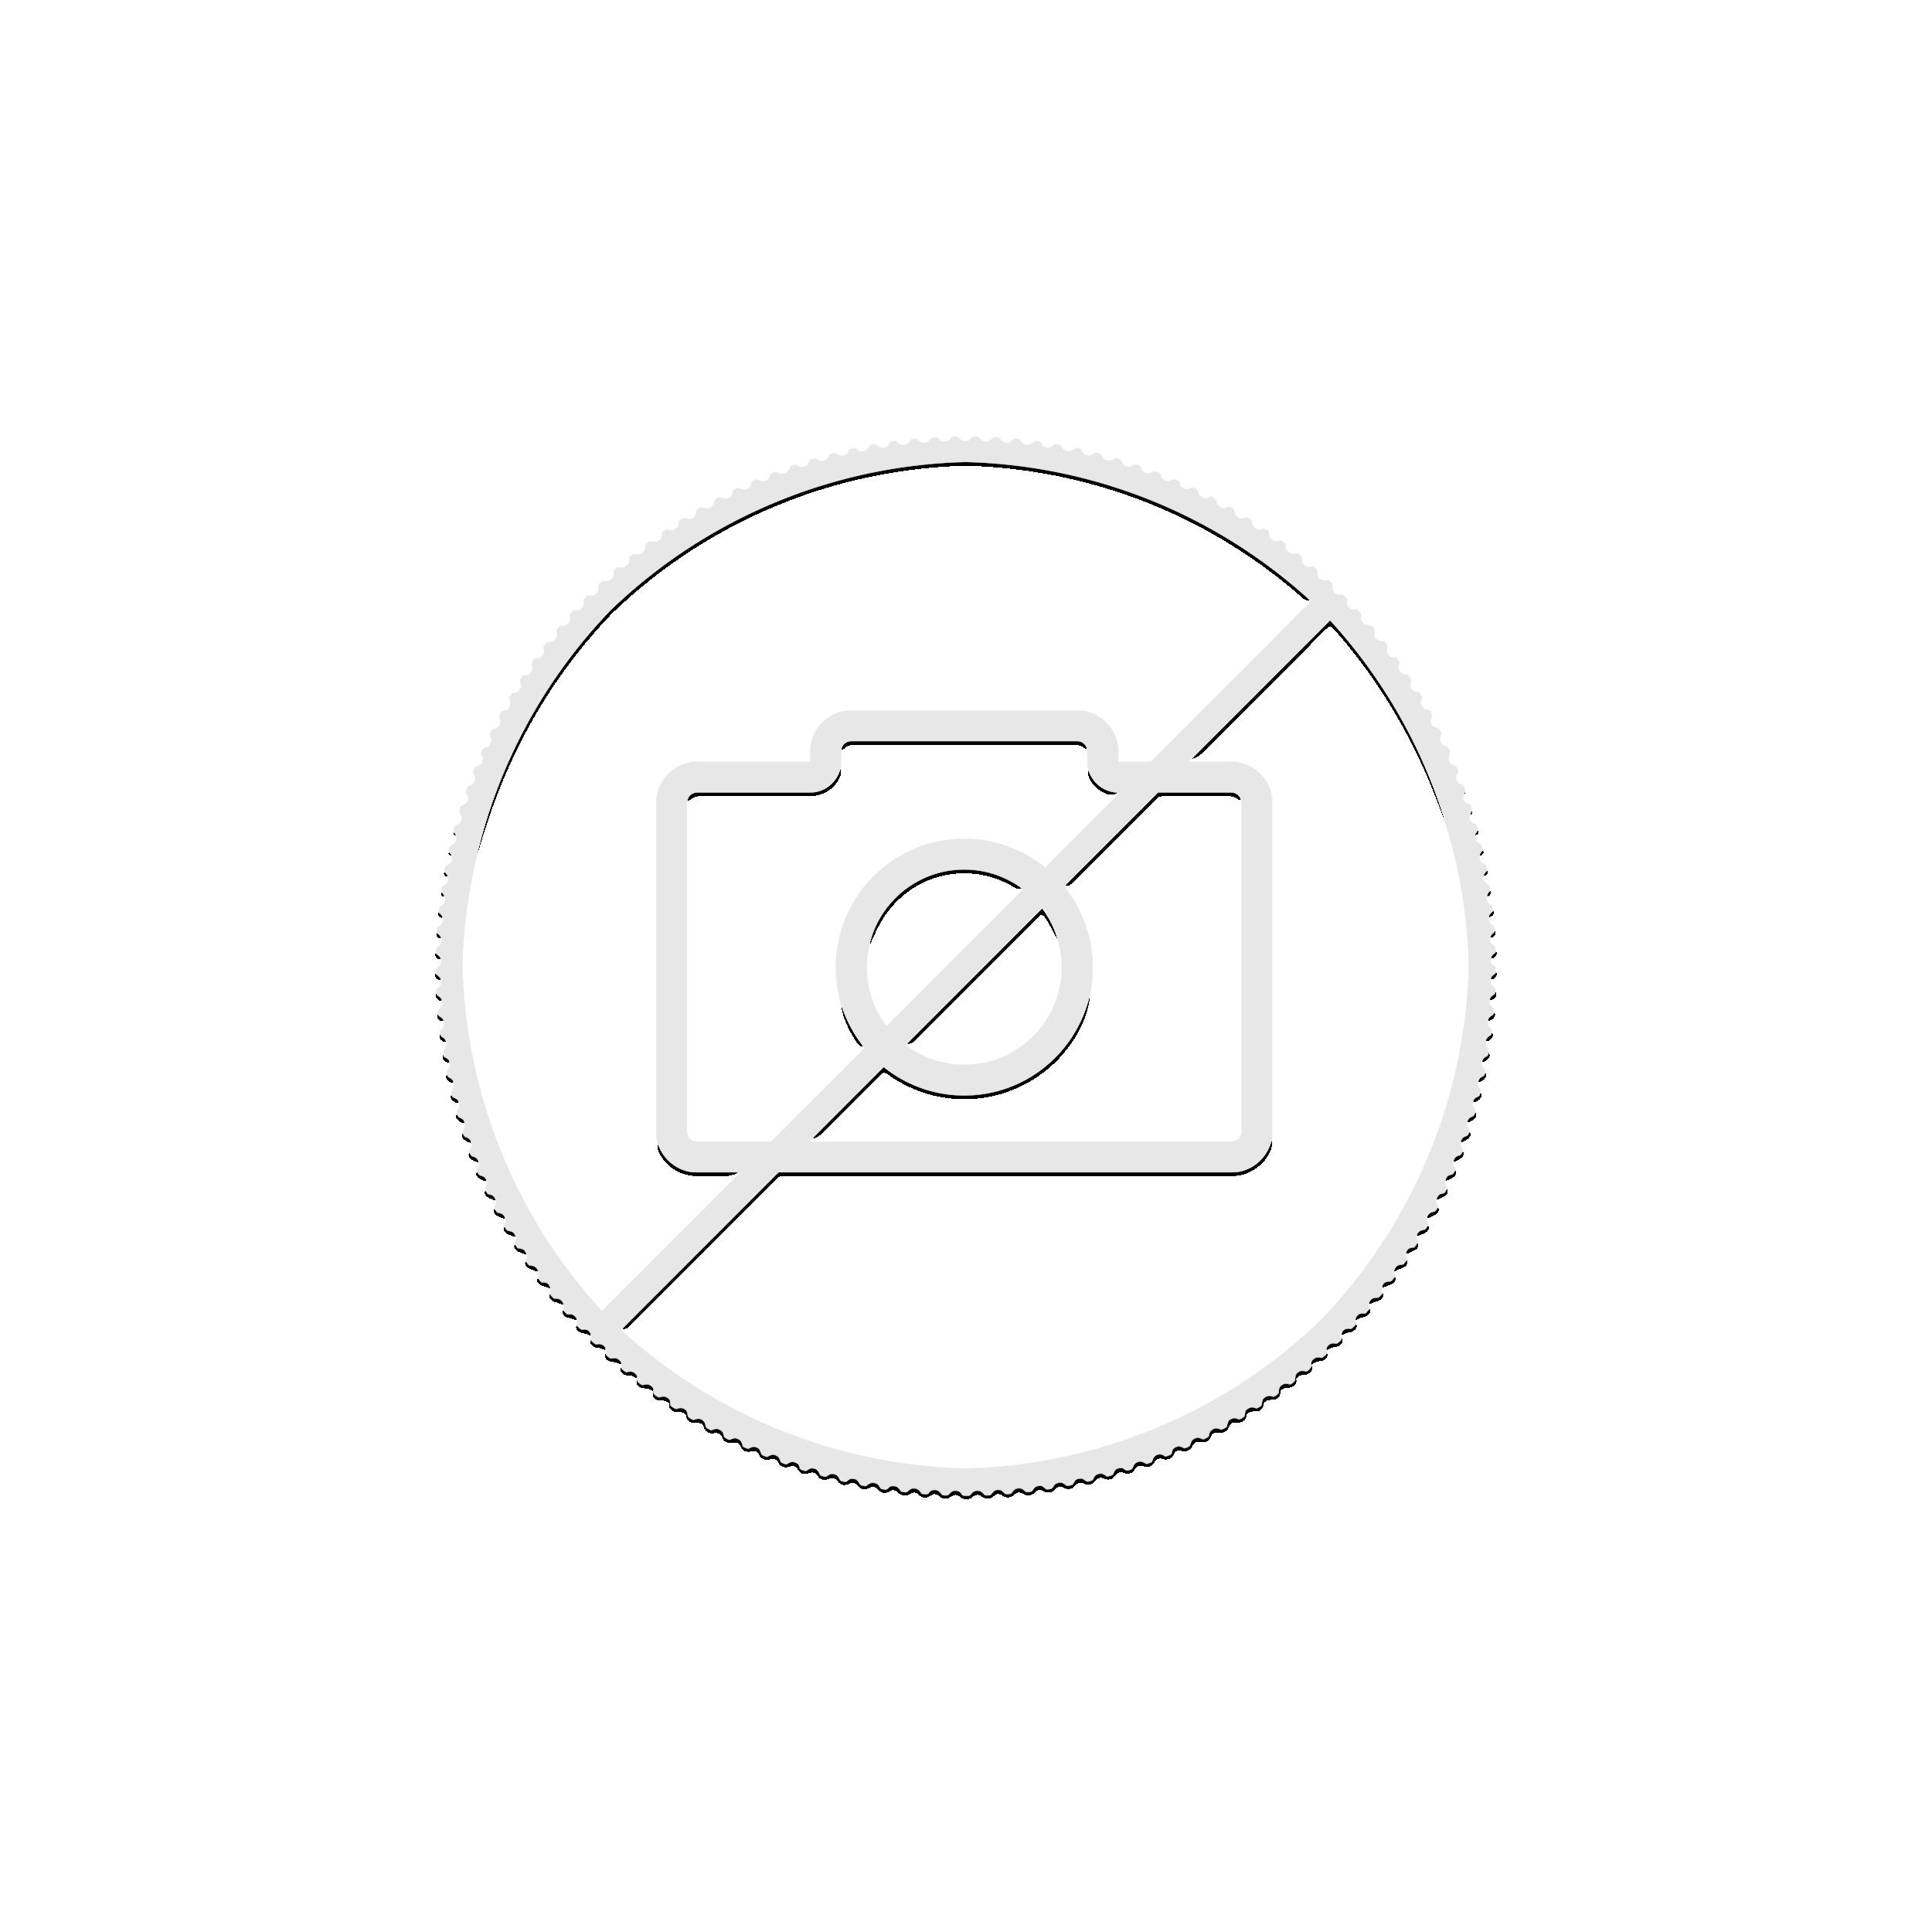 1 Troy ounce gouden munt Krugerrand 2021 Proof